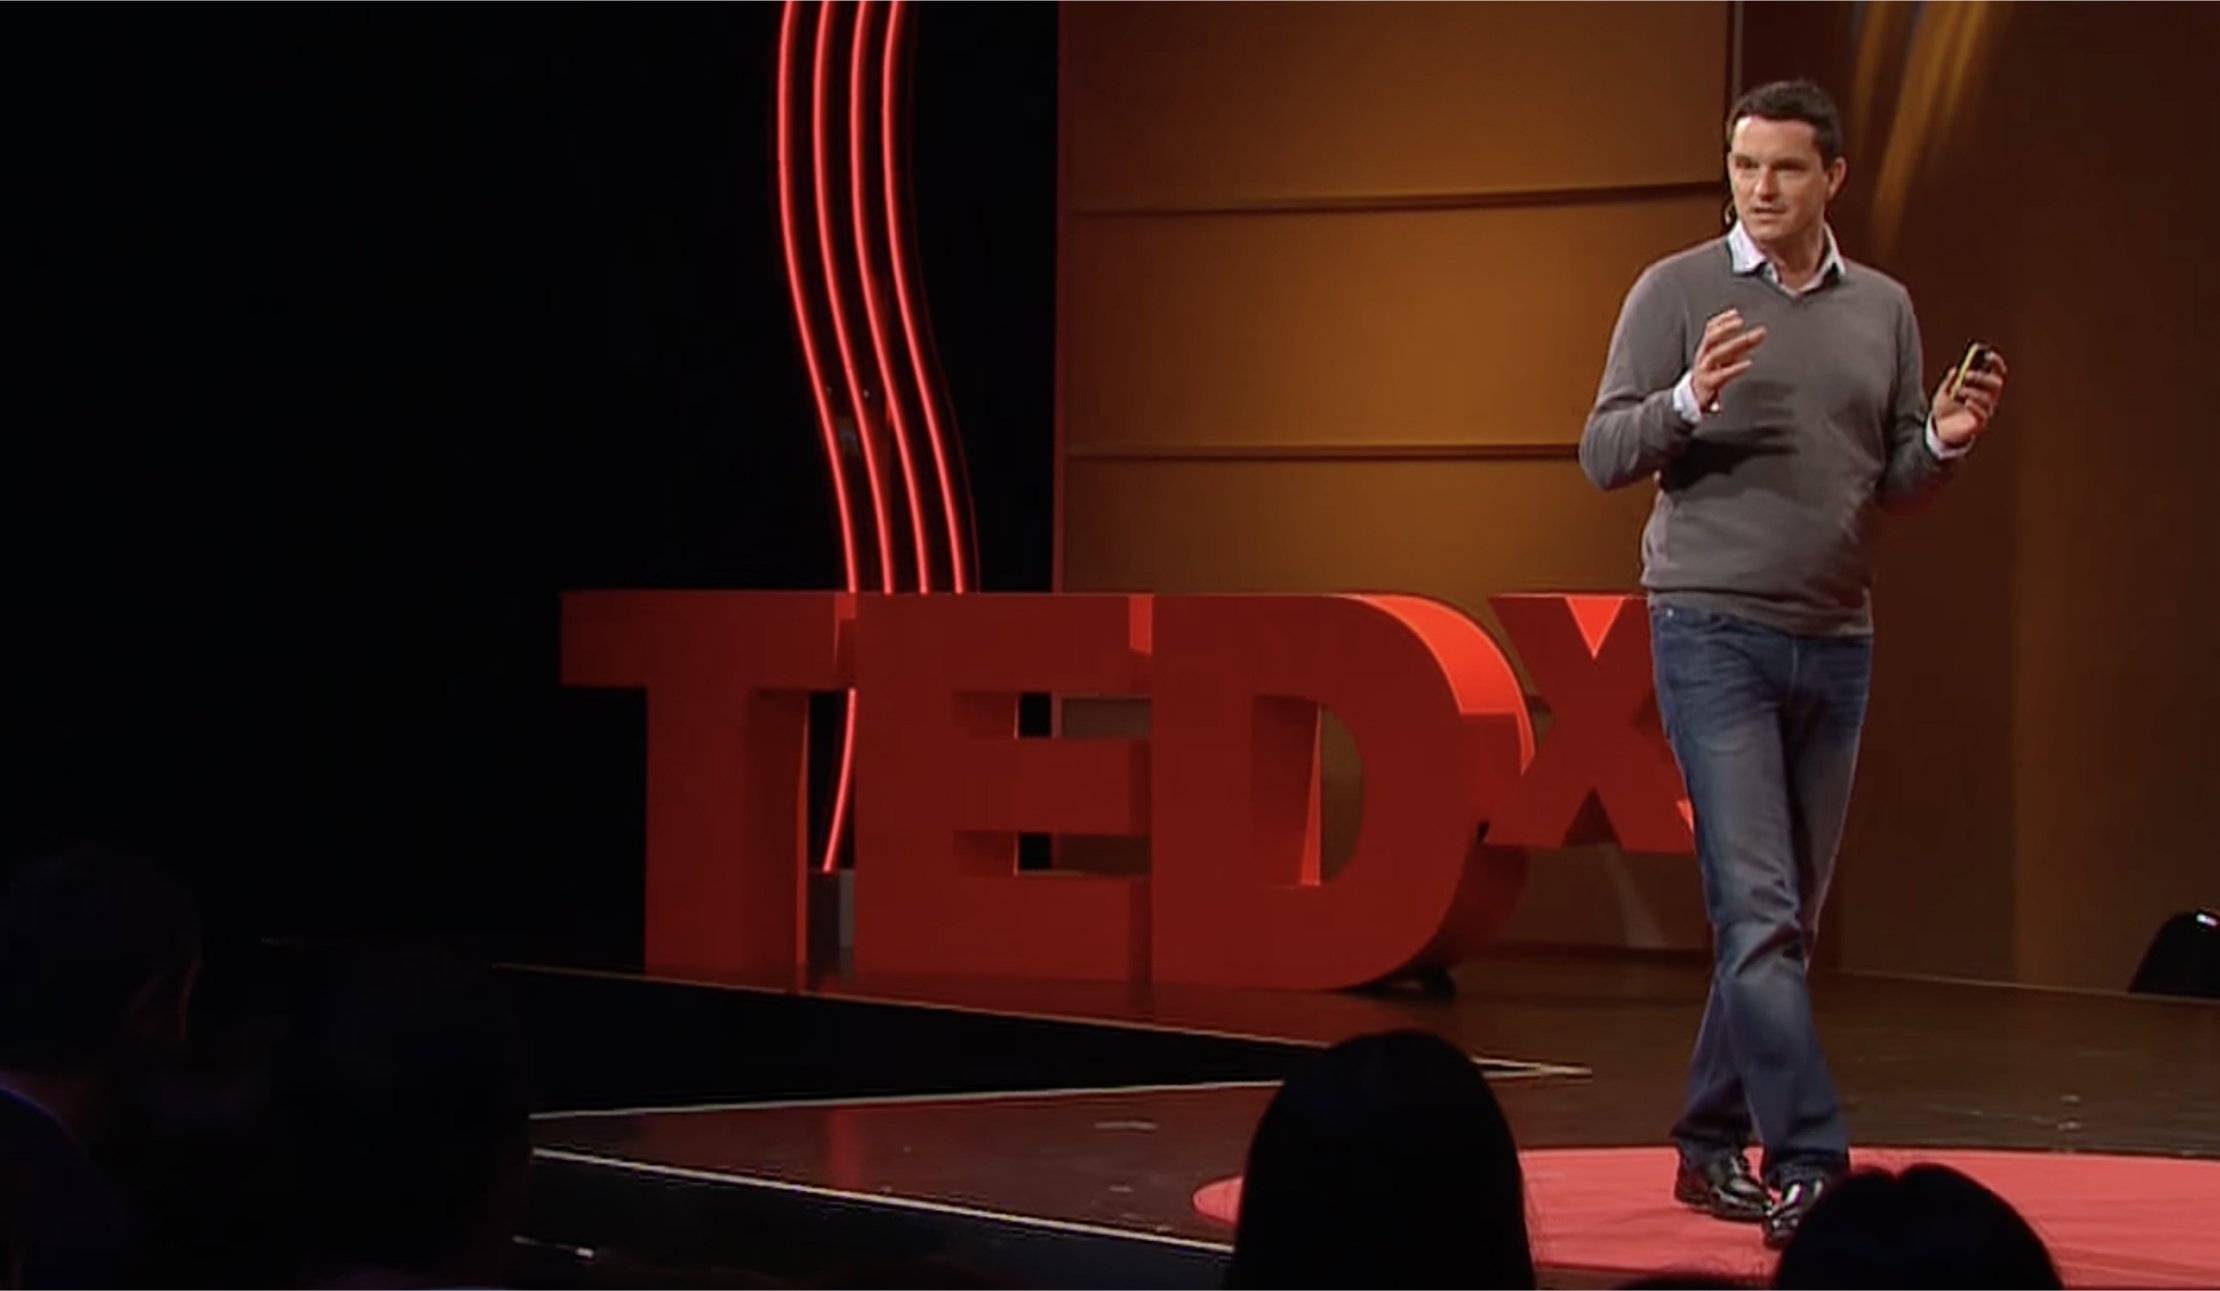 tedx speech